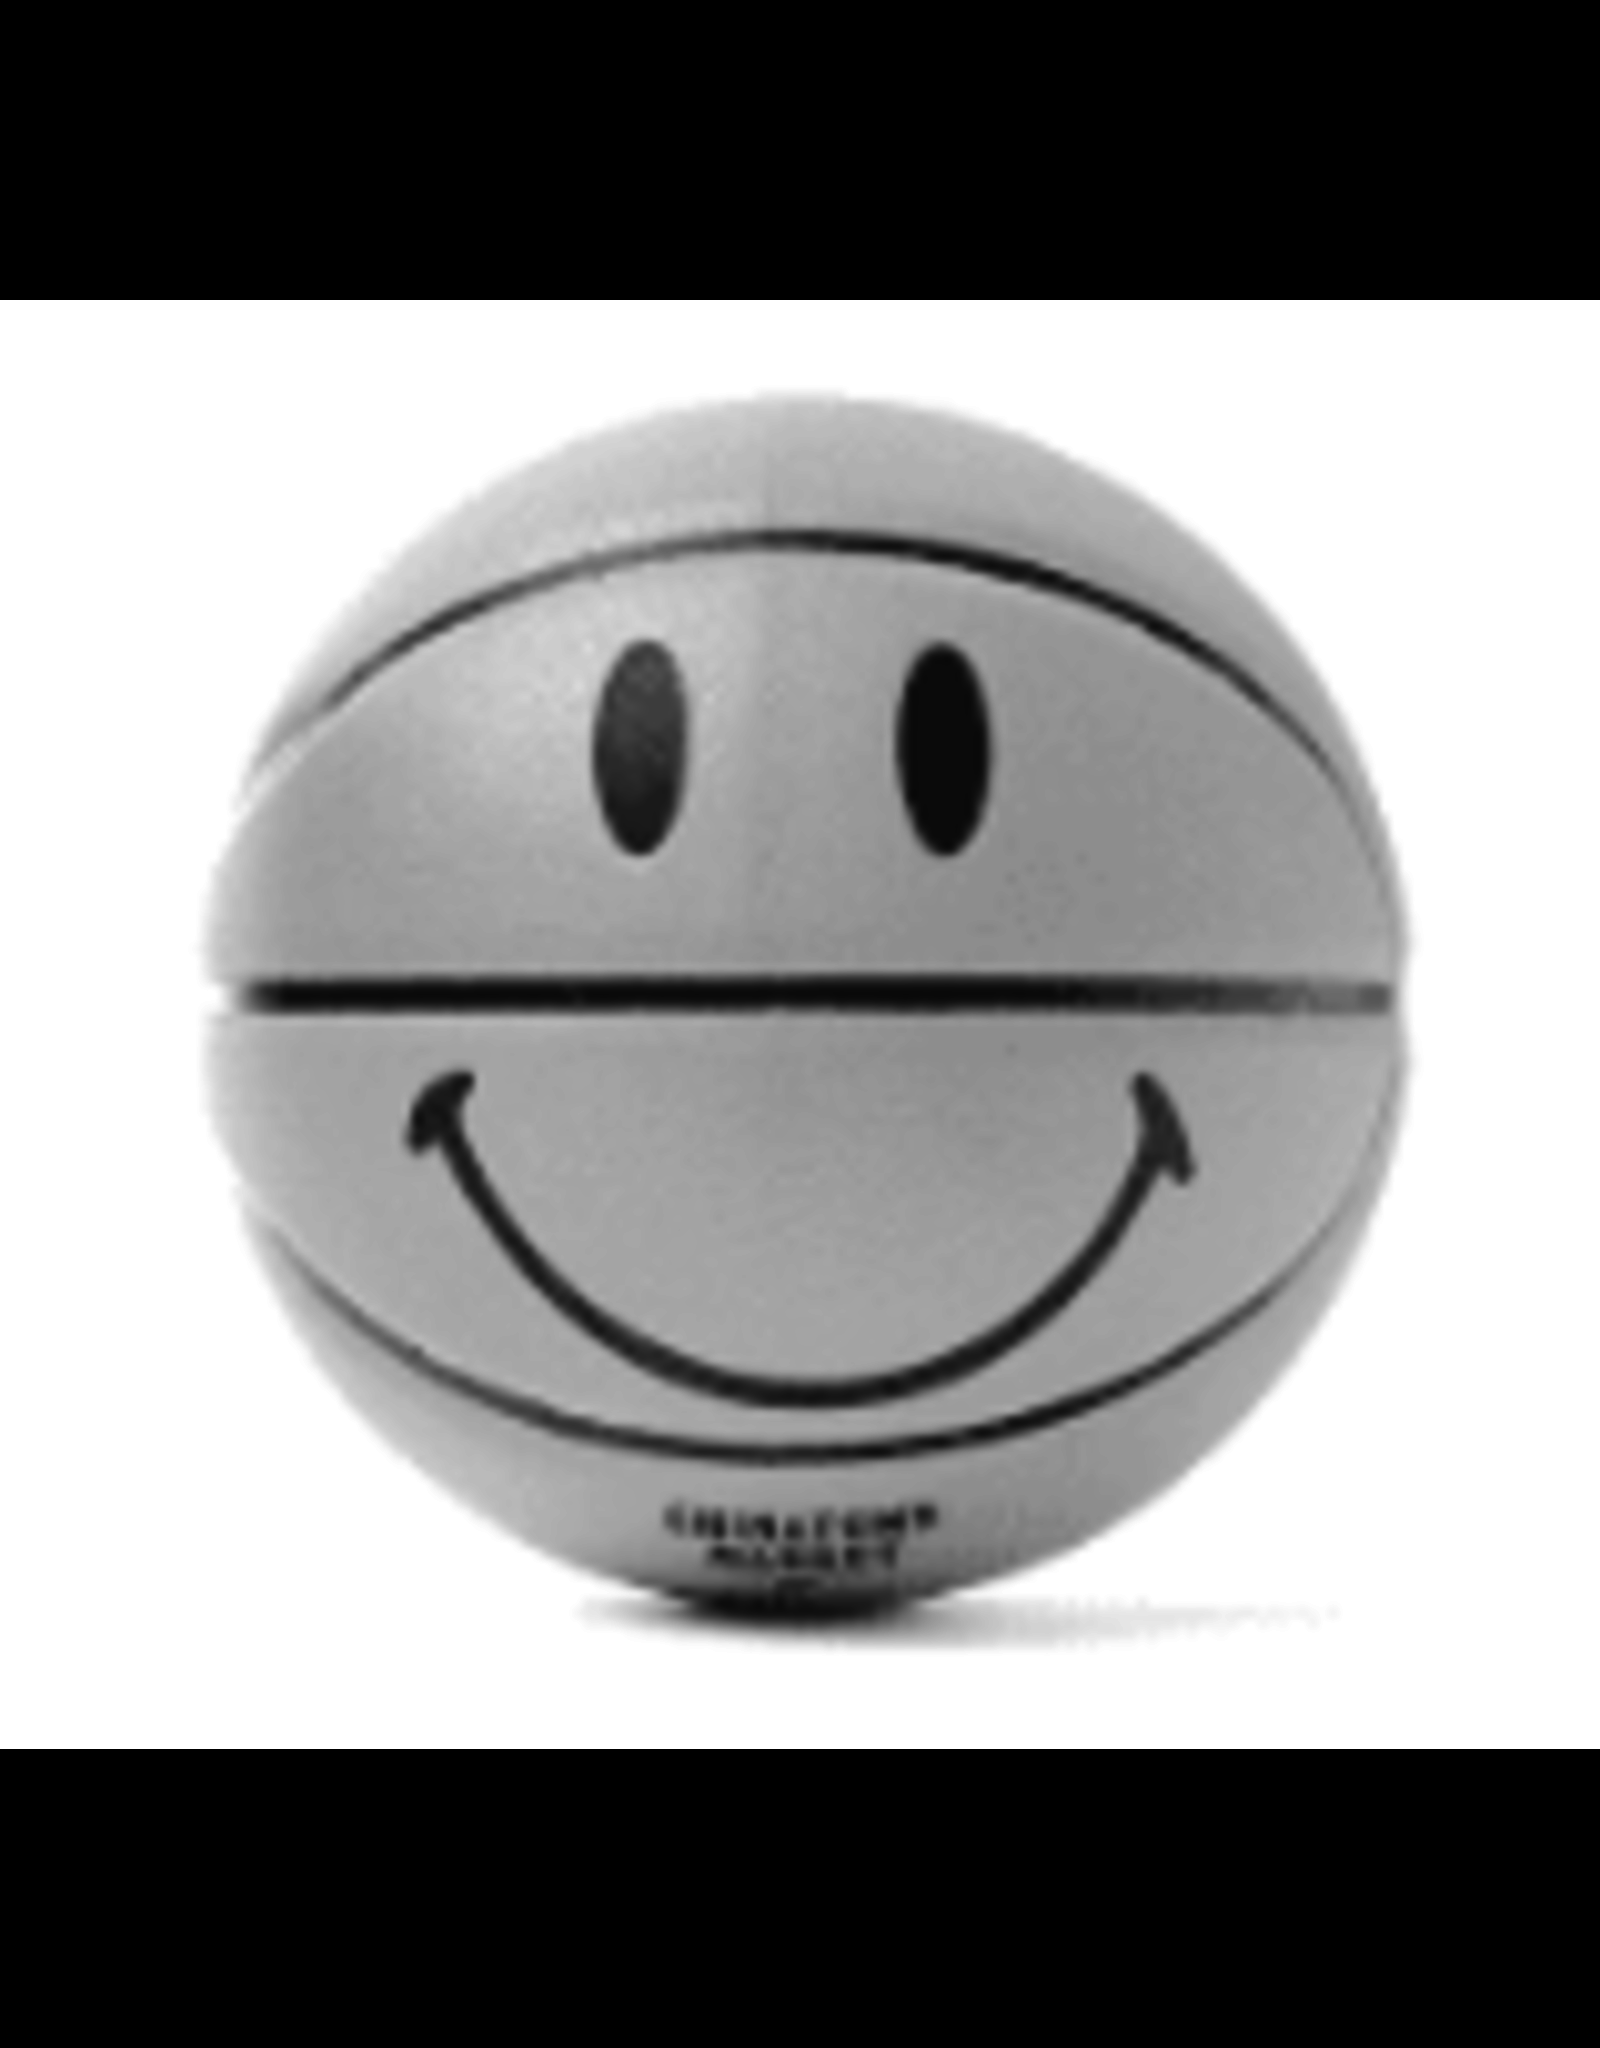 CHINATOWN MARKET SMILEY 3M BASKETBALL